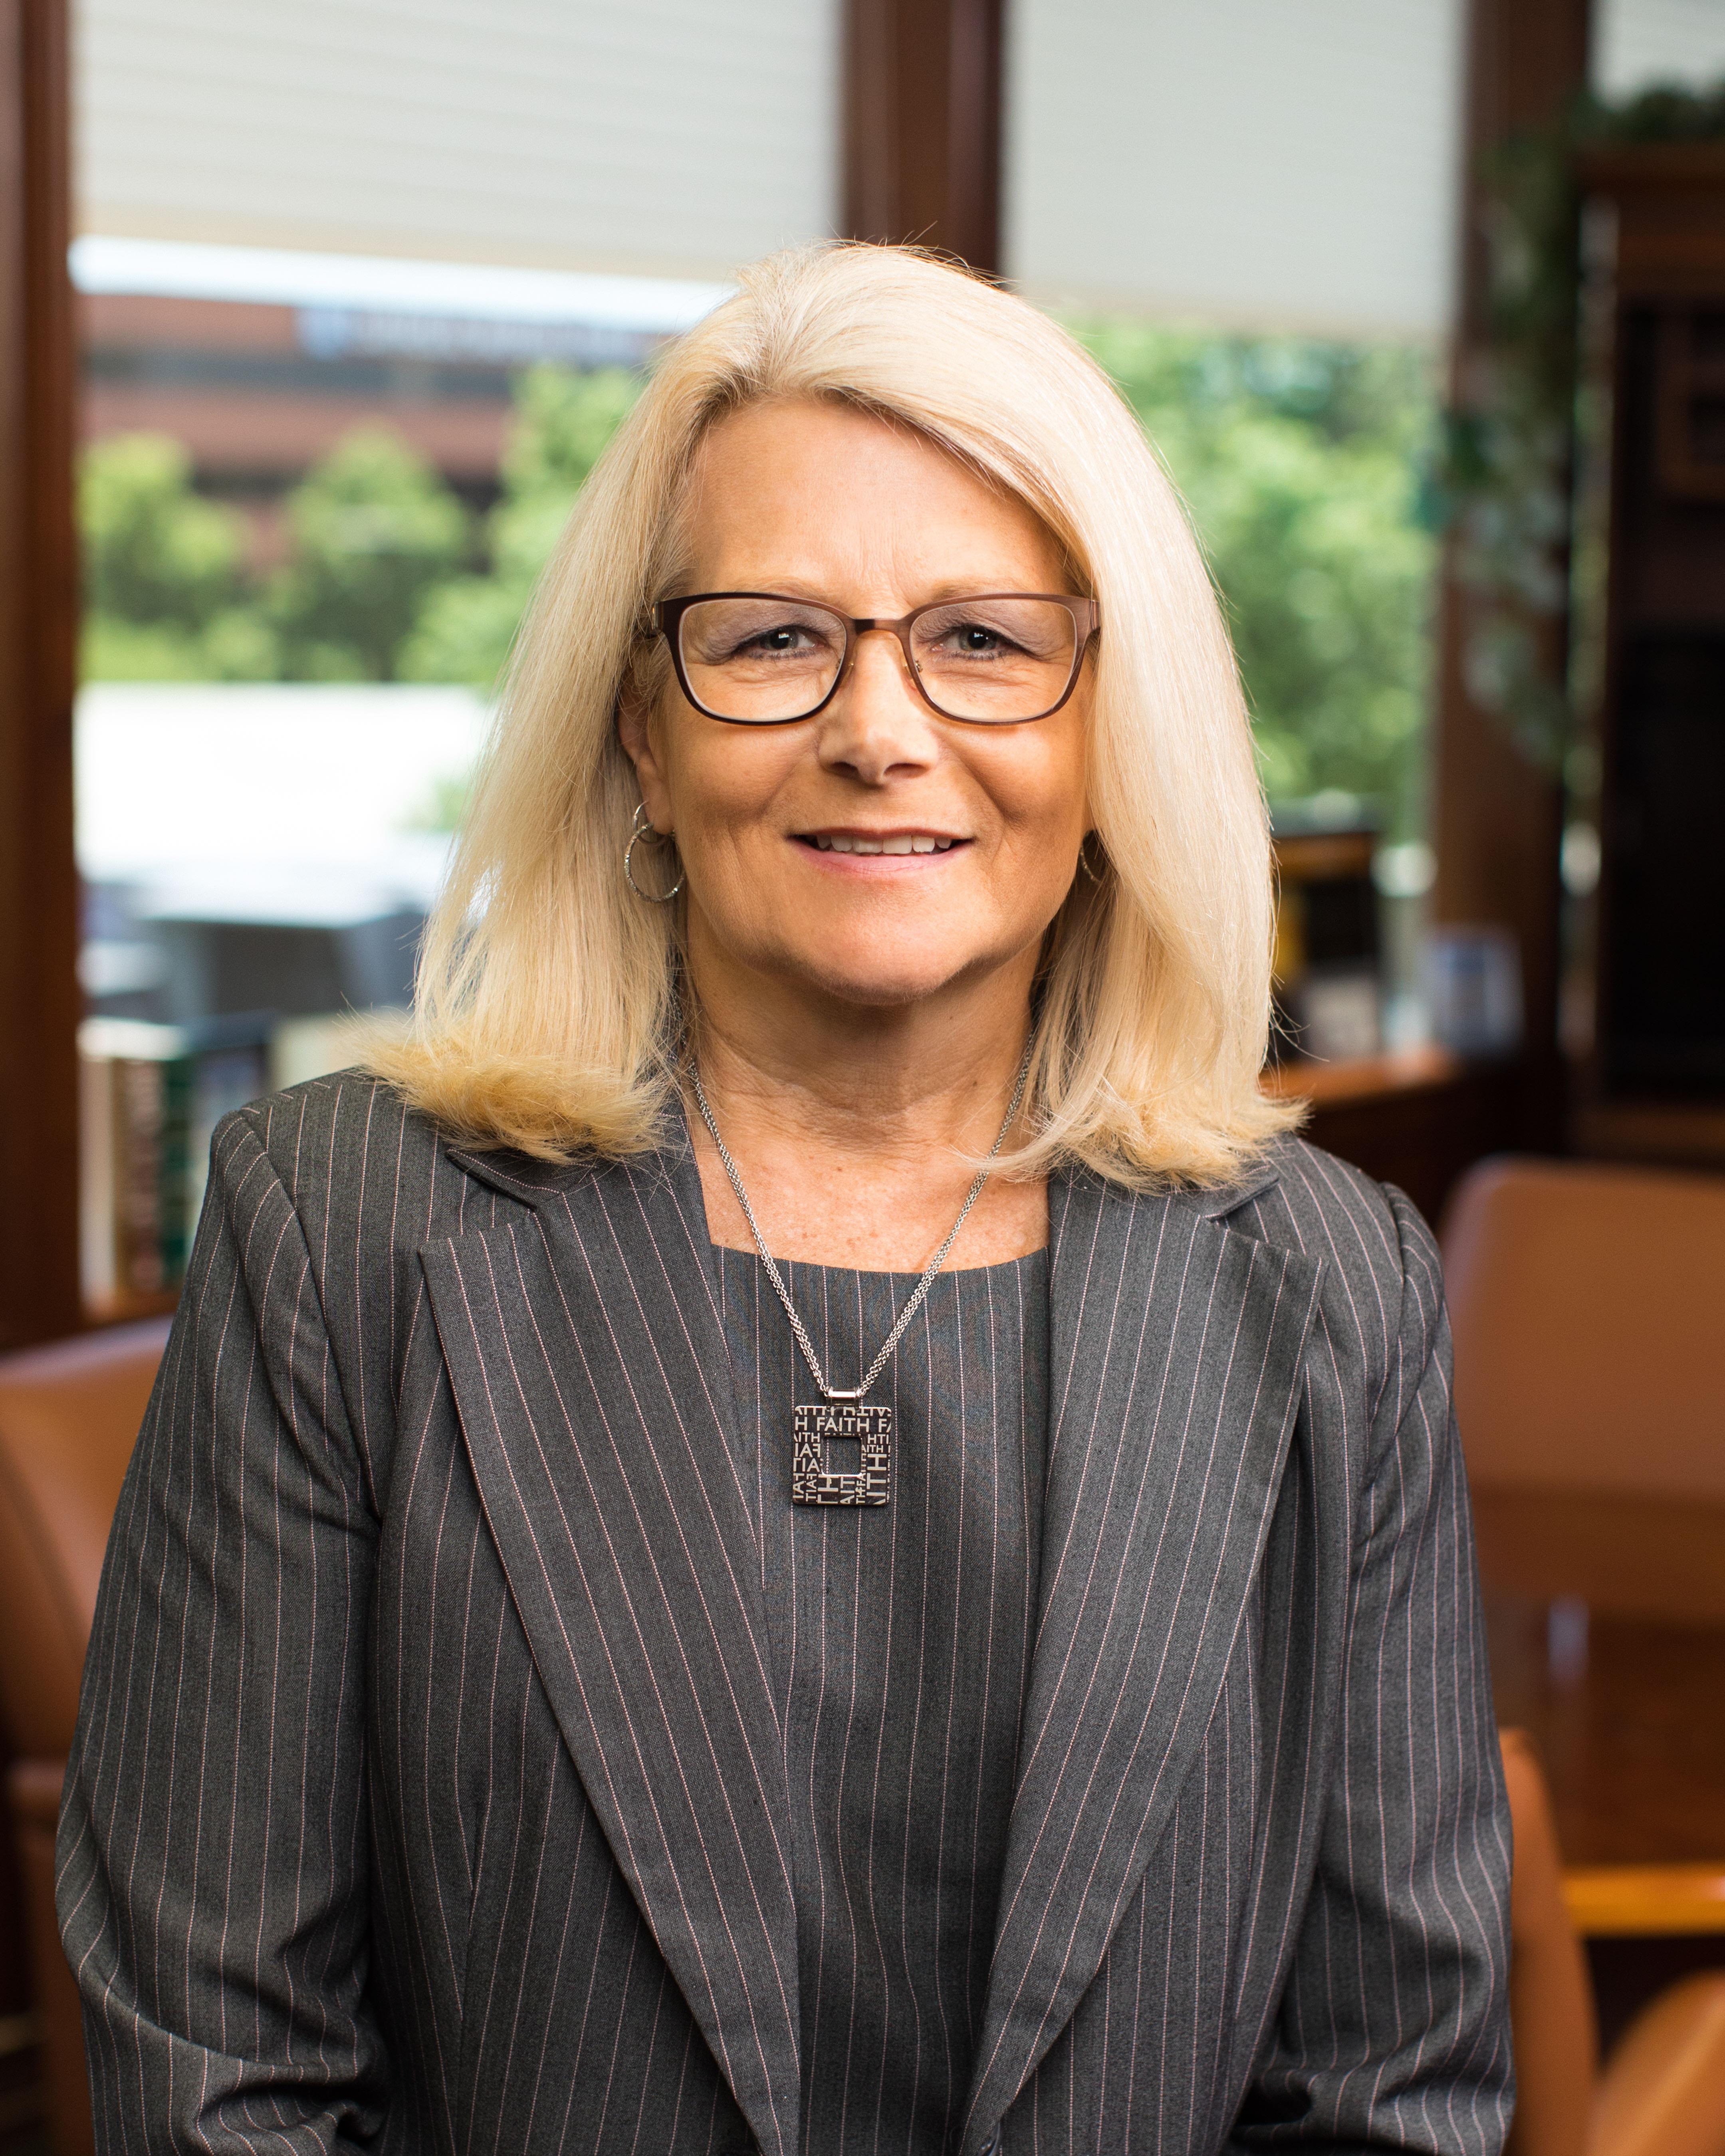 Janice Bjornstad's headshot